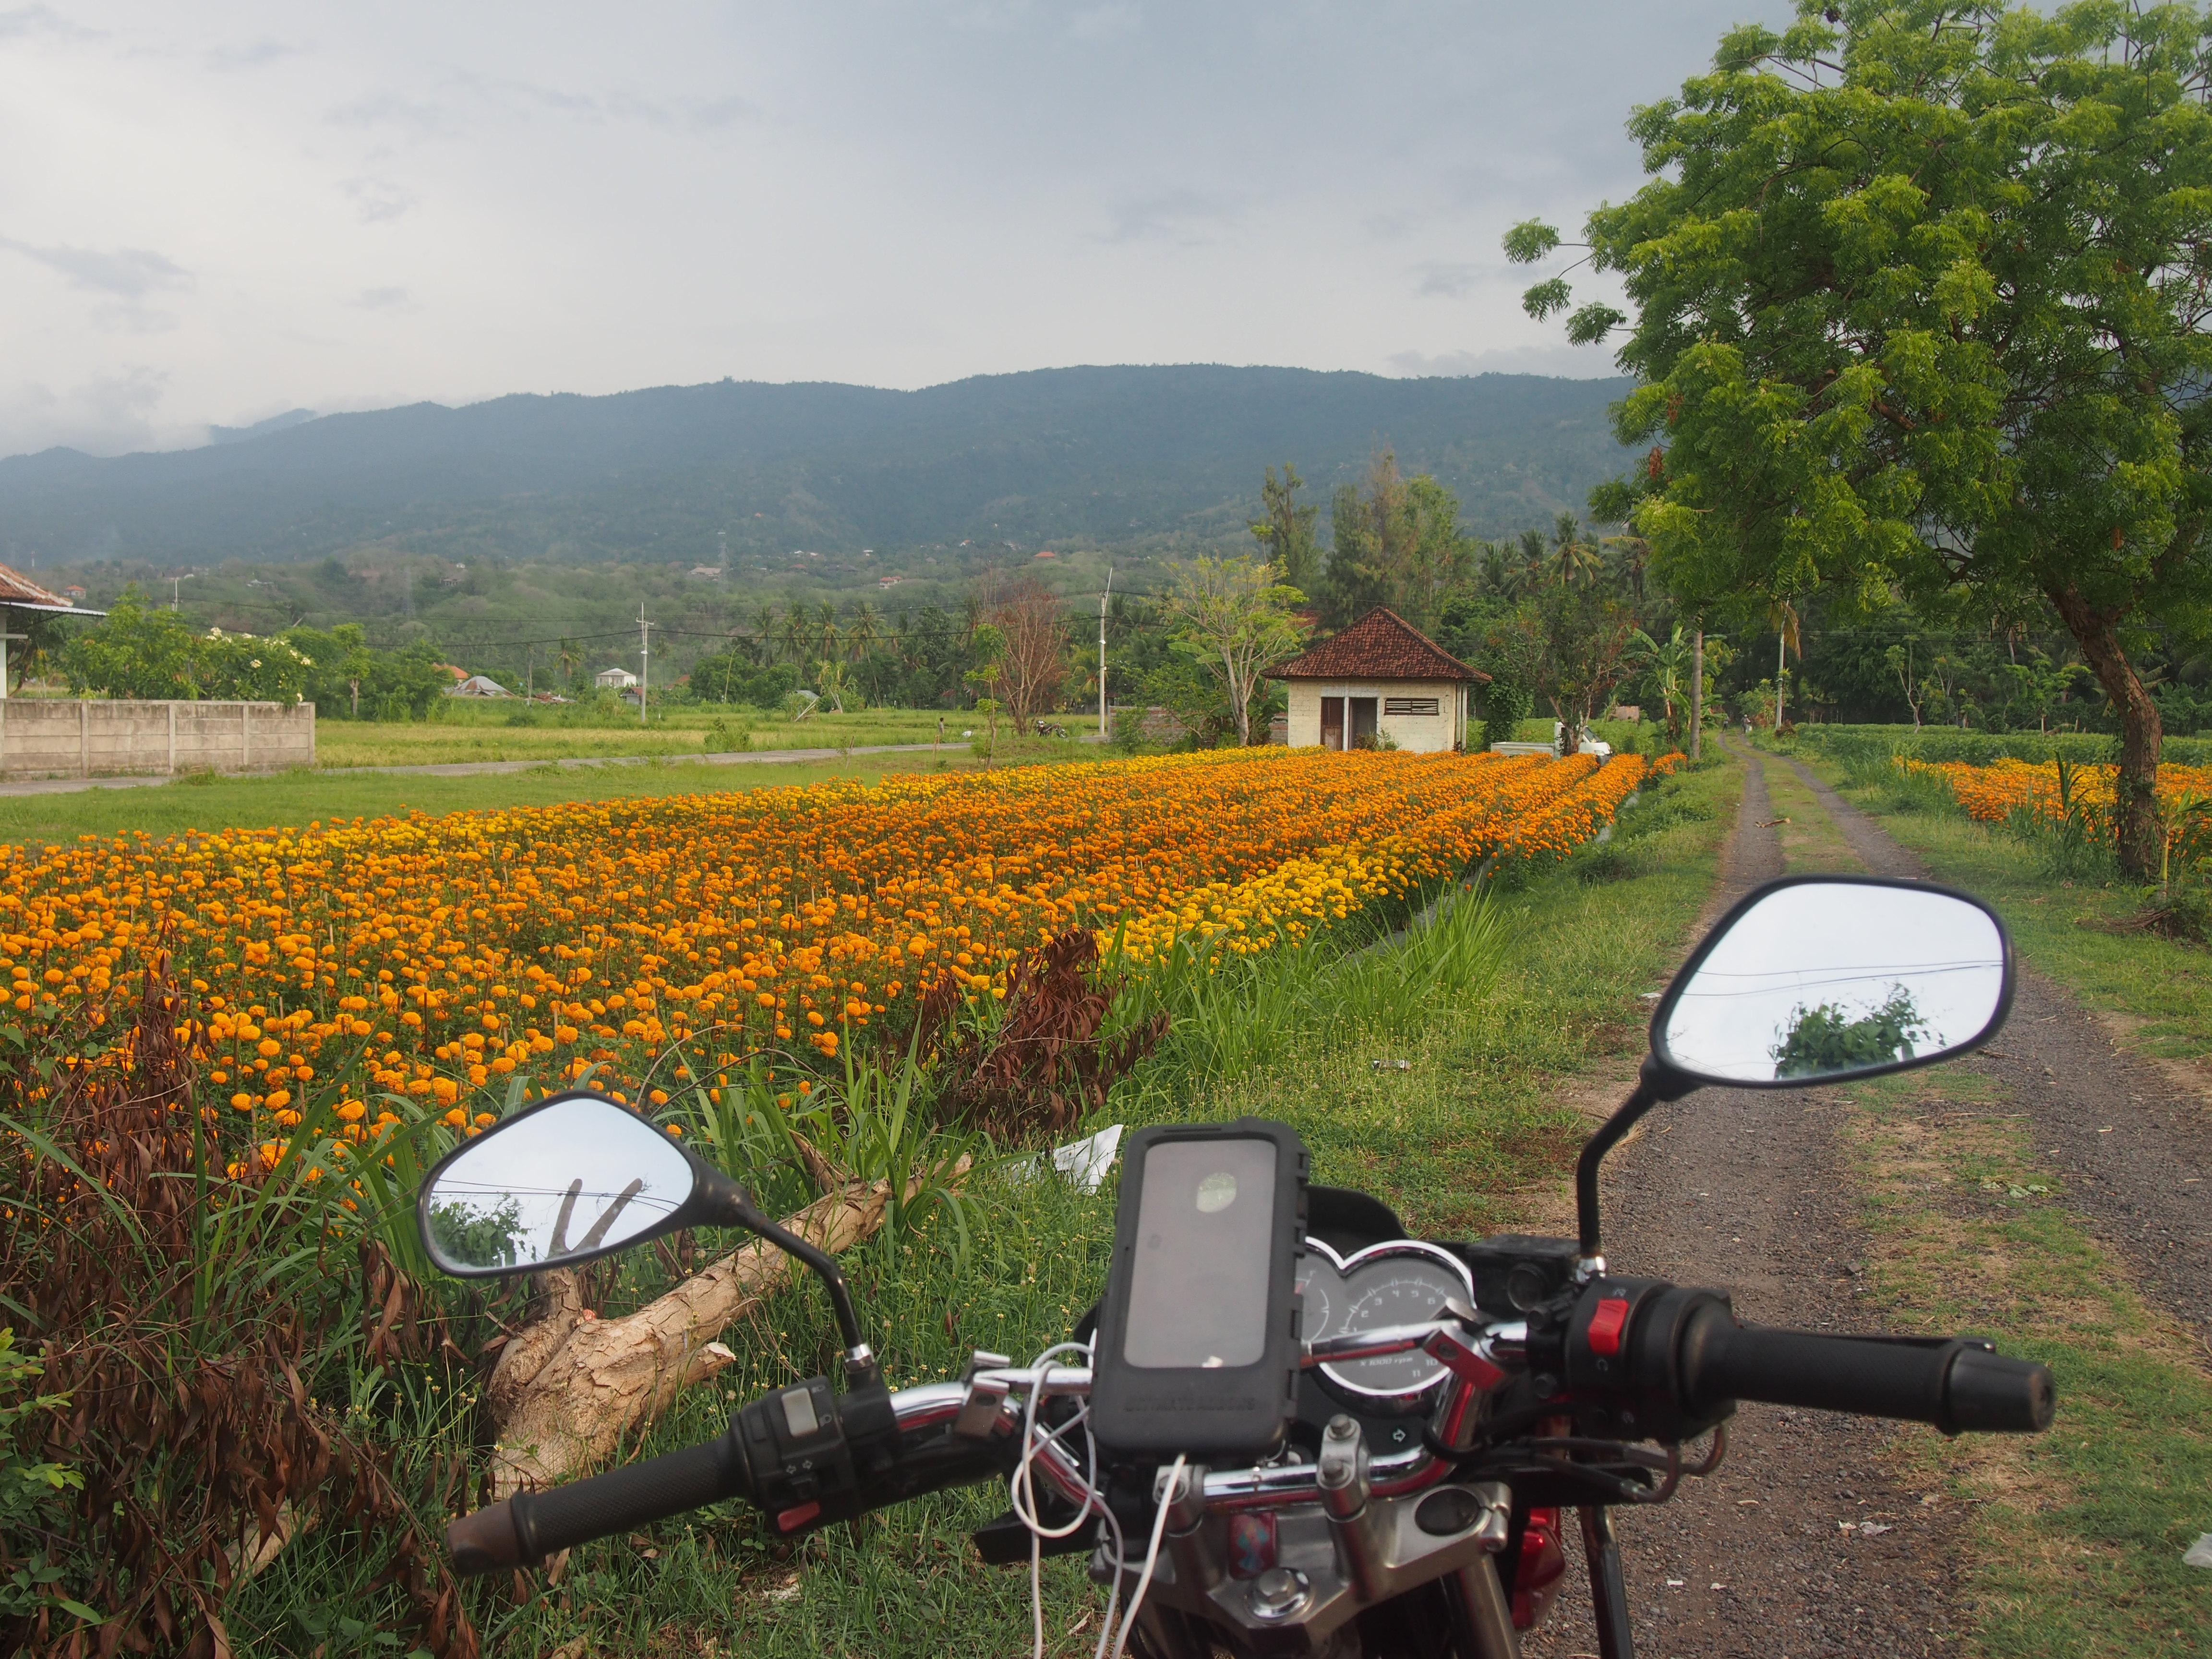 Lovina, northern Bali